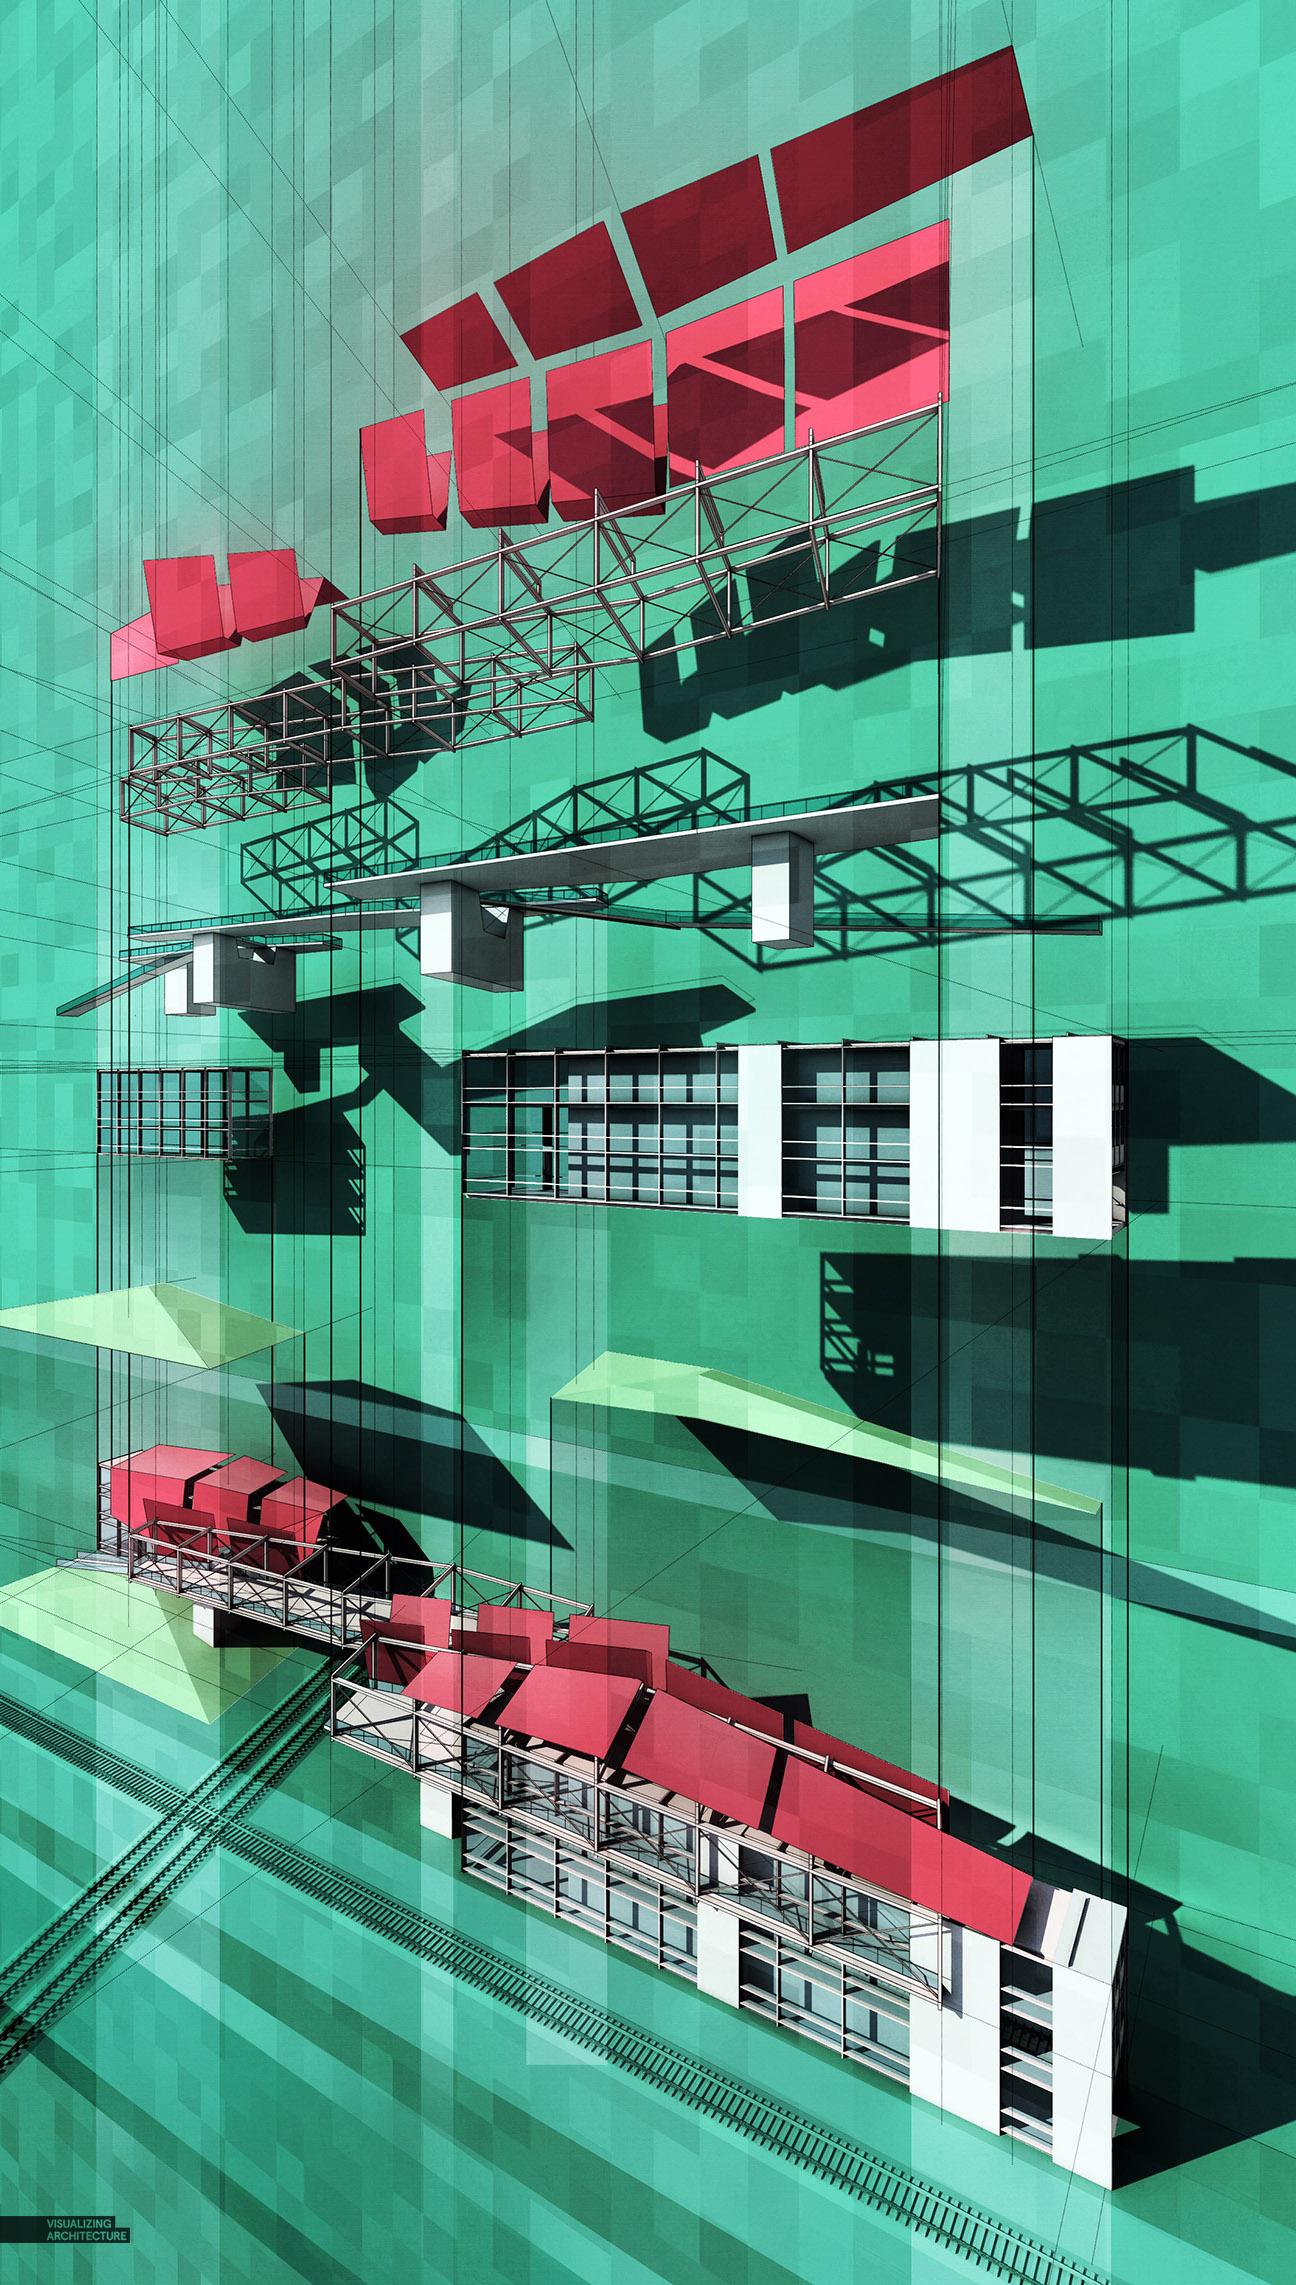 winter in space diagram 2002 mazda tribute engine train pavilion exploded axon | visualizing architecture